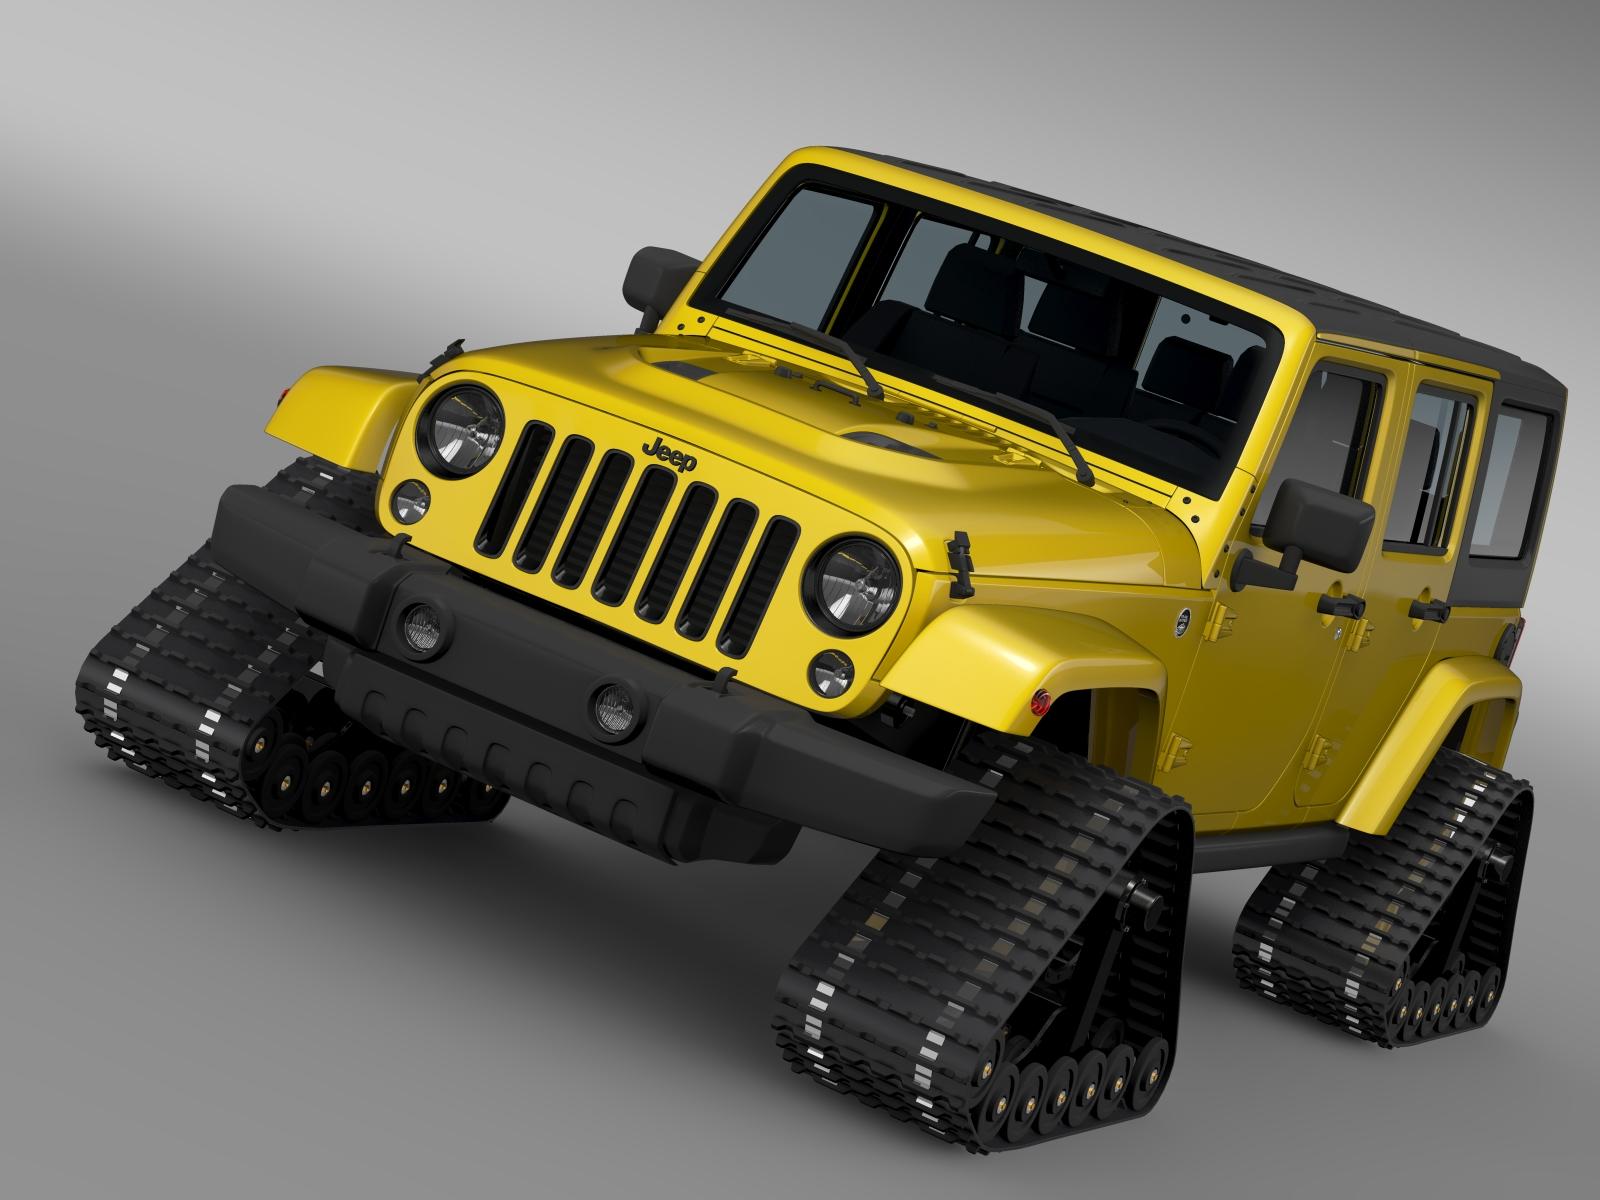 jeep wrangler unlimited x1 crawler 2016 3d model 3ds max fbx c4d lwo ma mb hrc xsi obj 217884